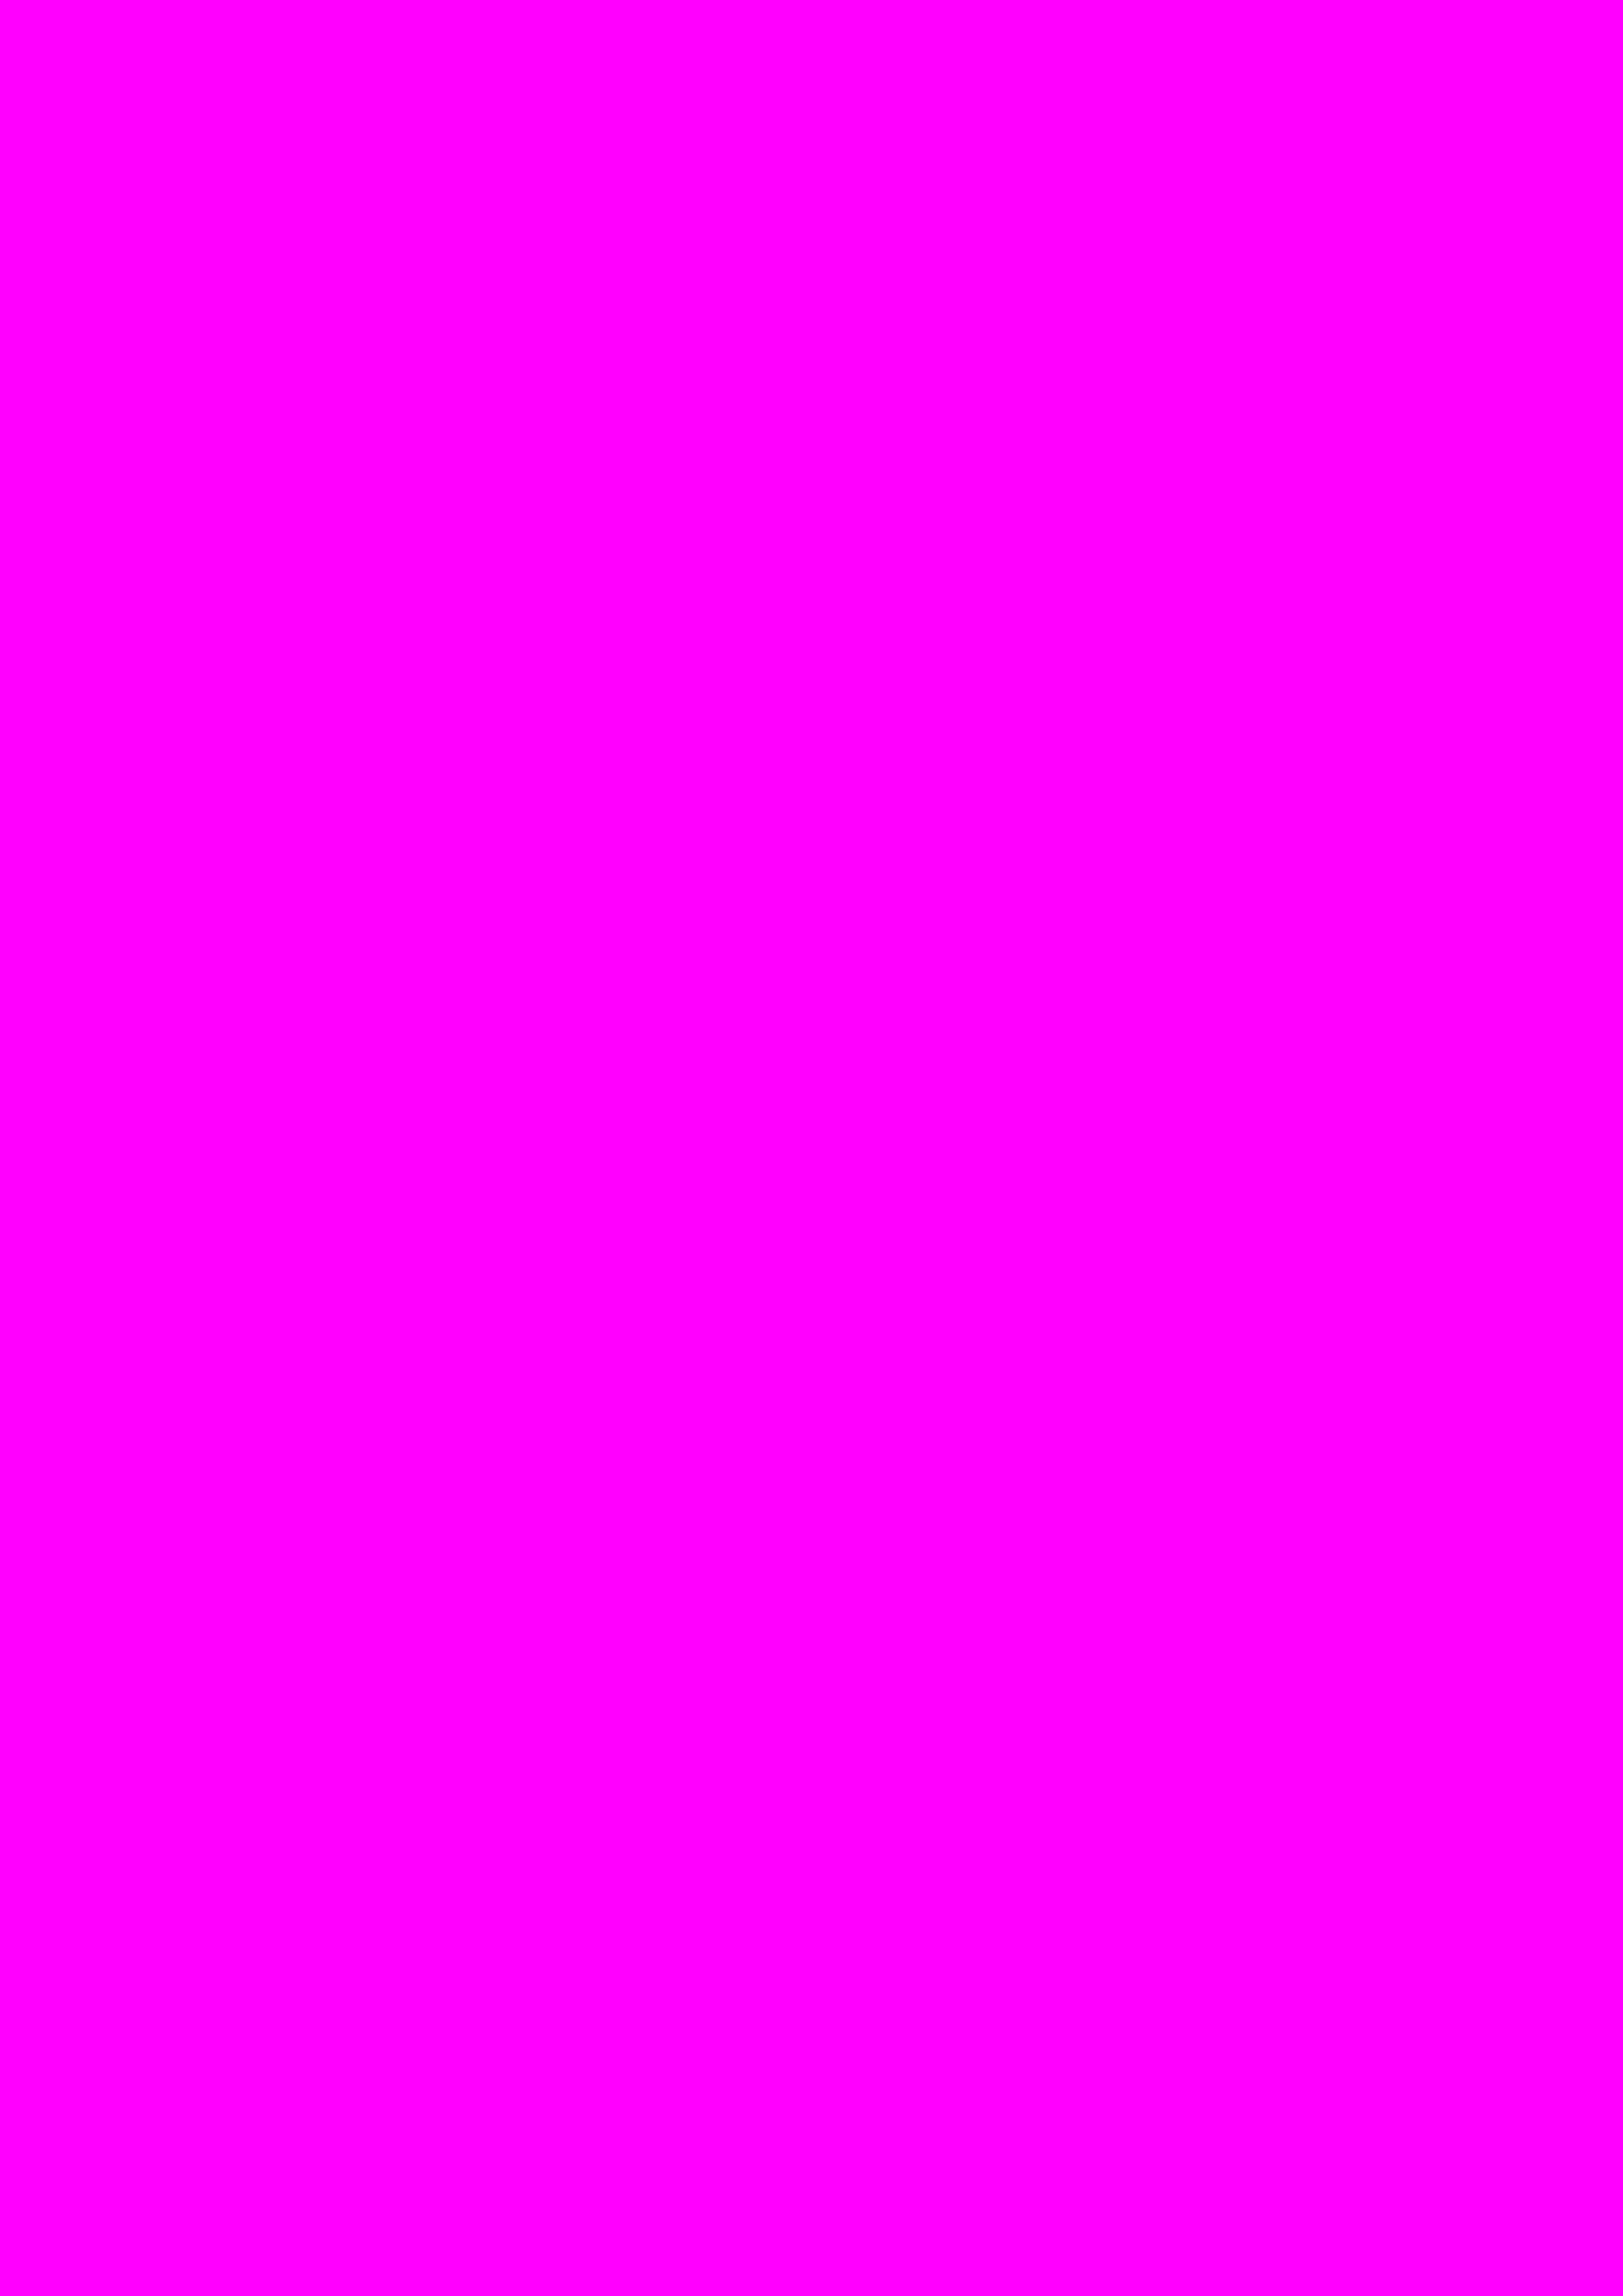 2480x3508 Magenta Solid Color Background